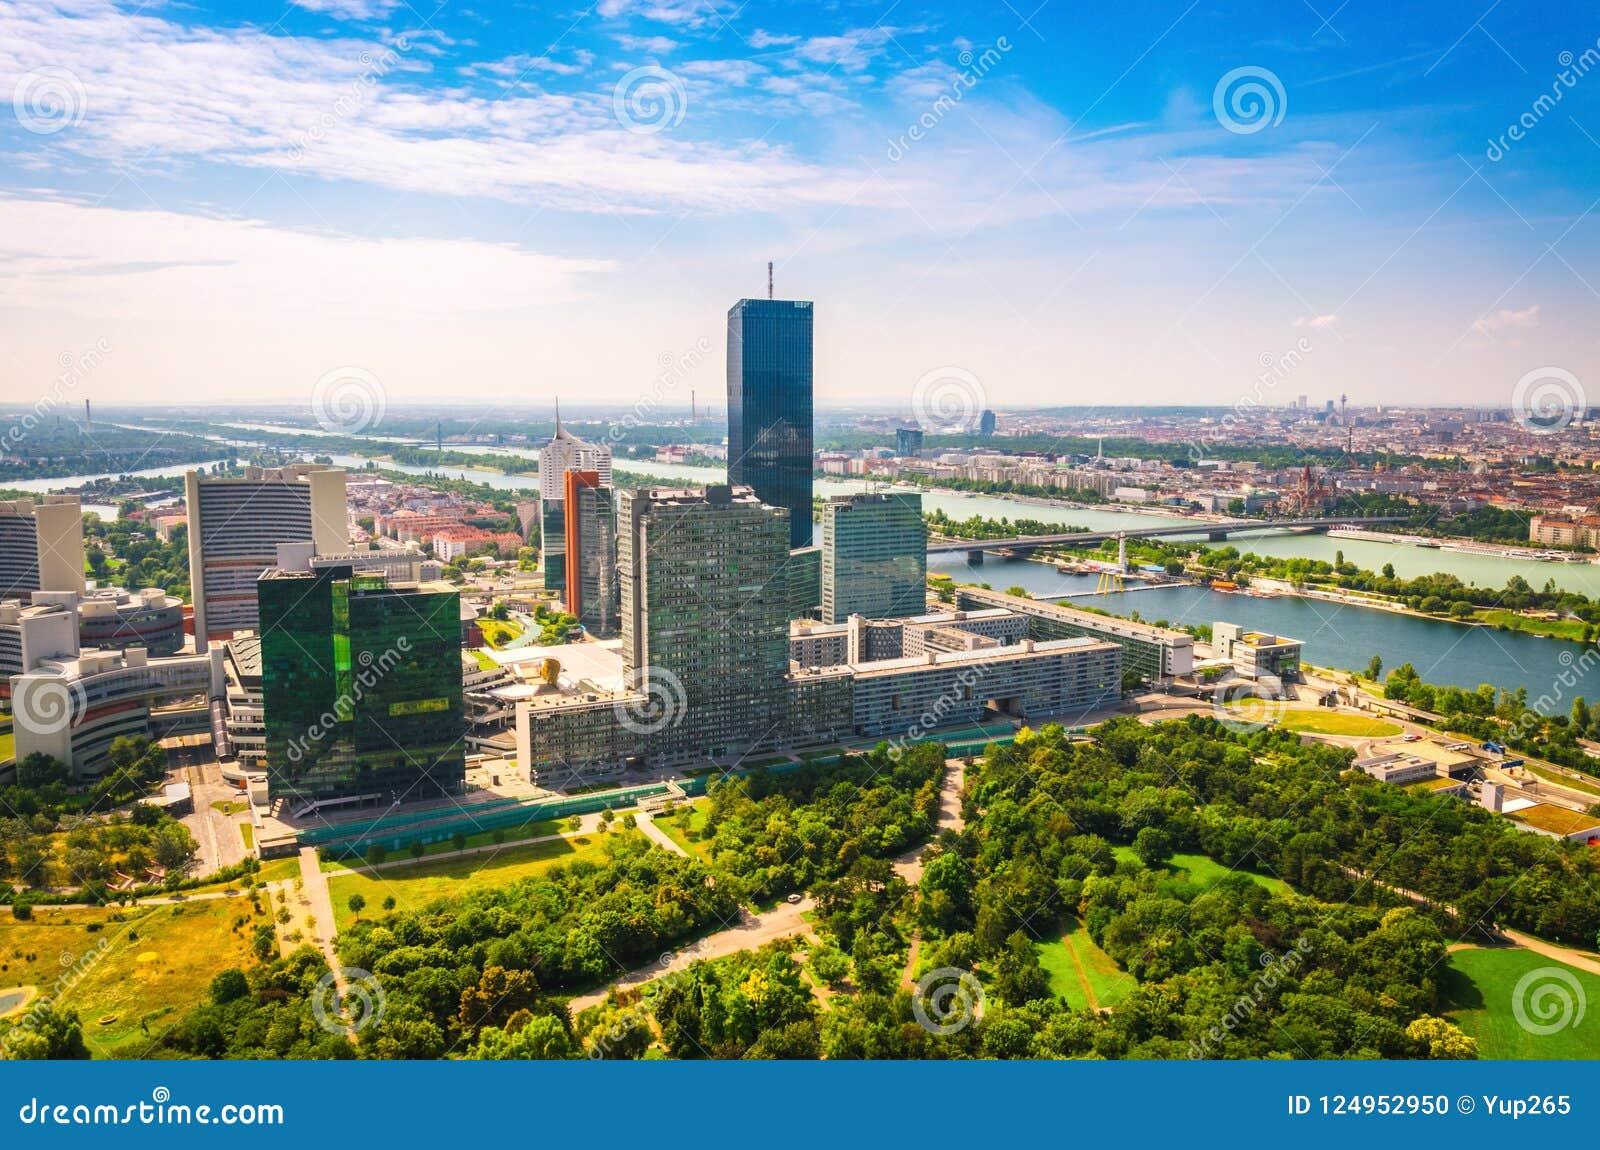 Panoramic view of Vienna business city center